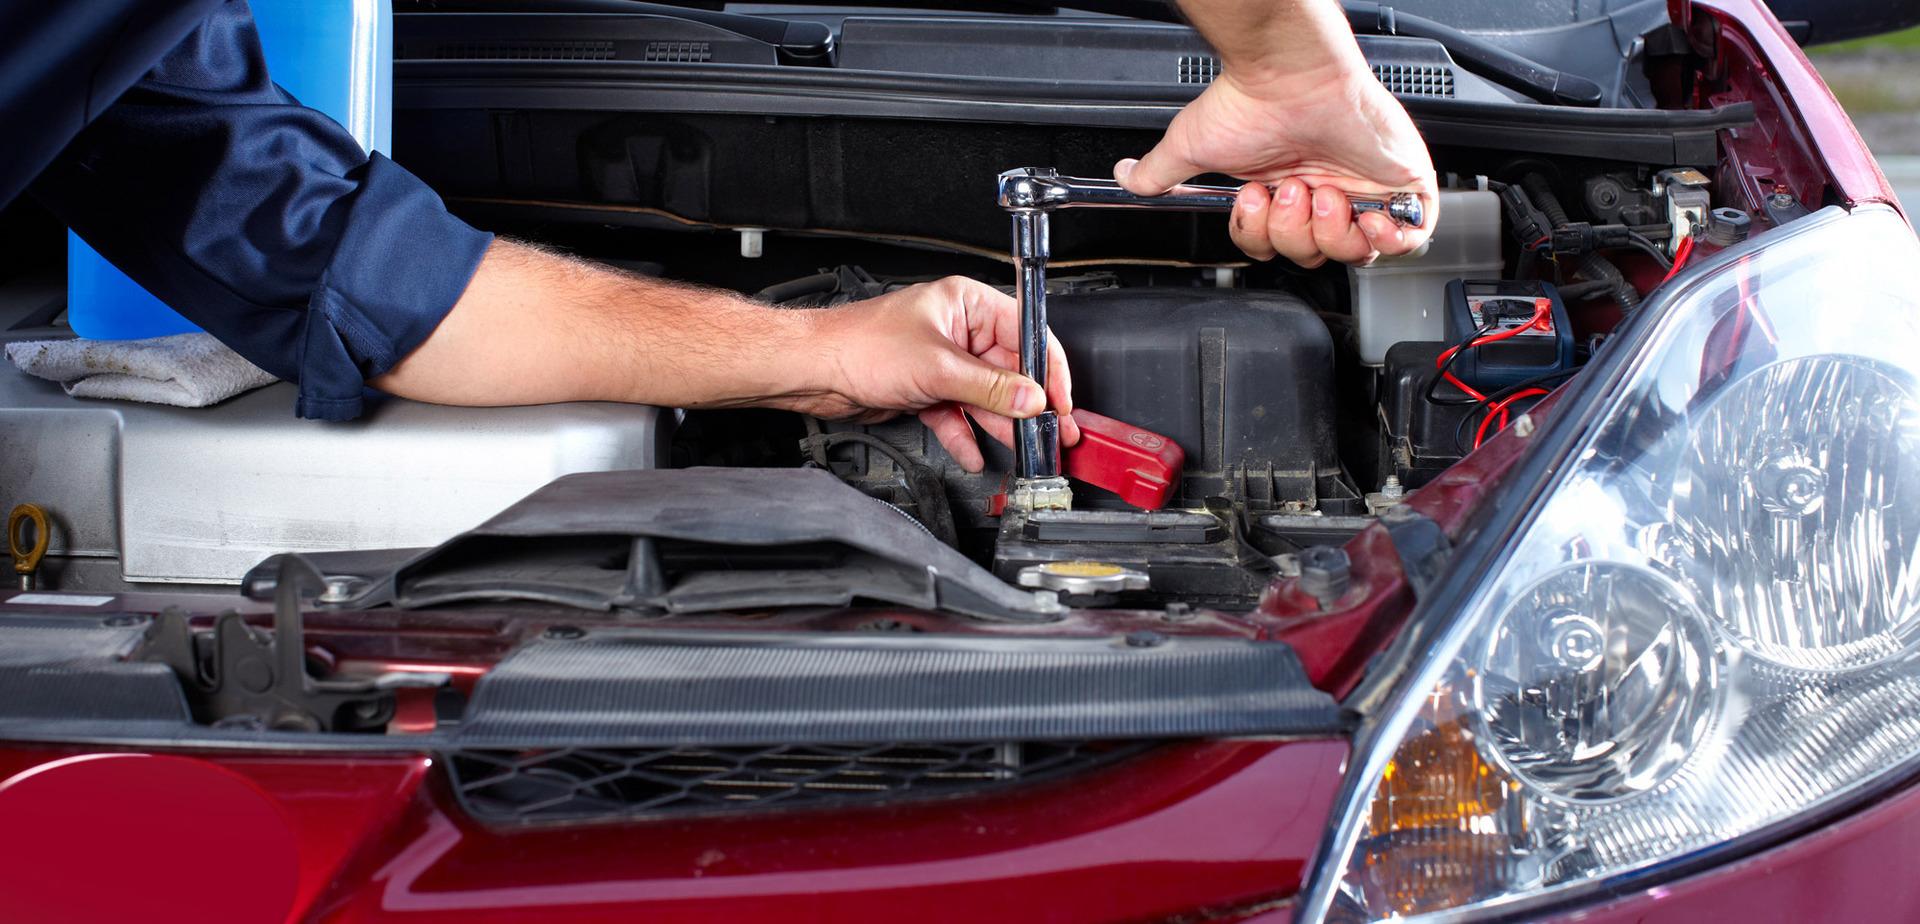 5 Tips To Choose A Car Dent Repair Specialist Car Repair